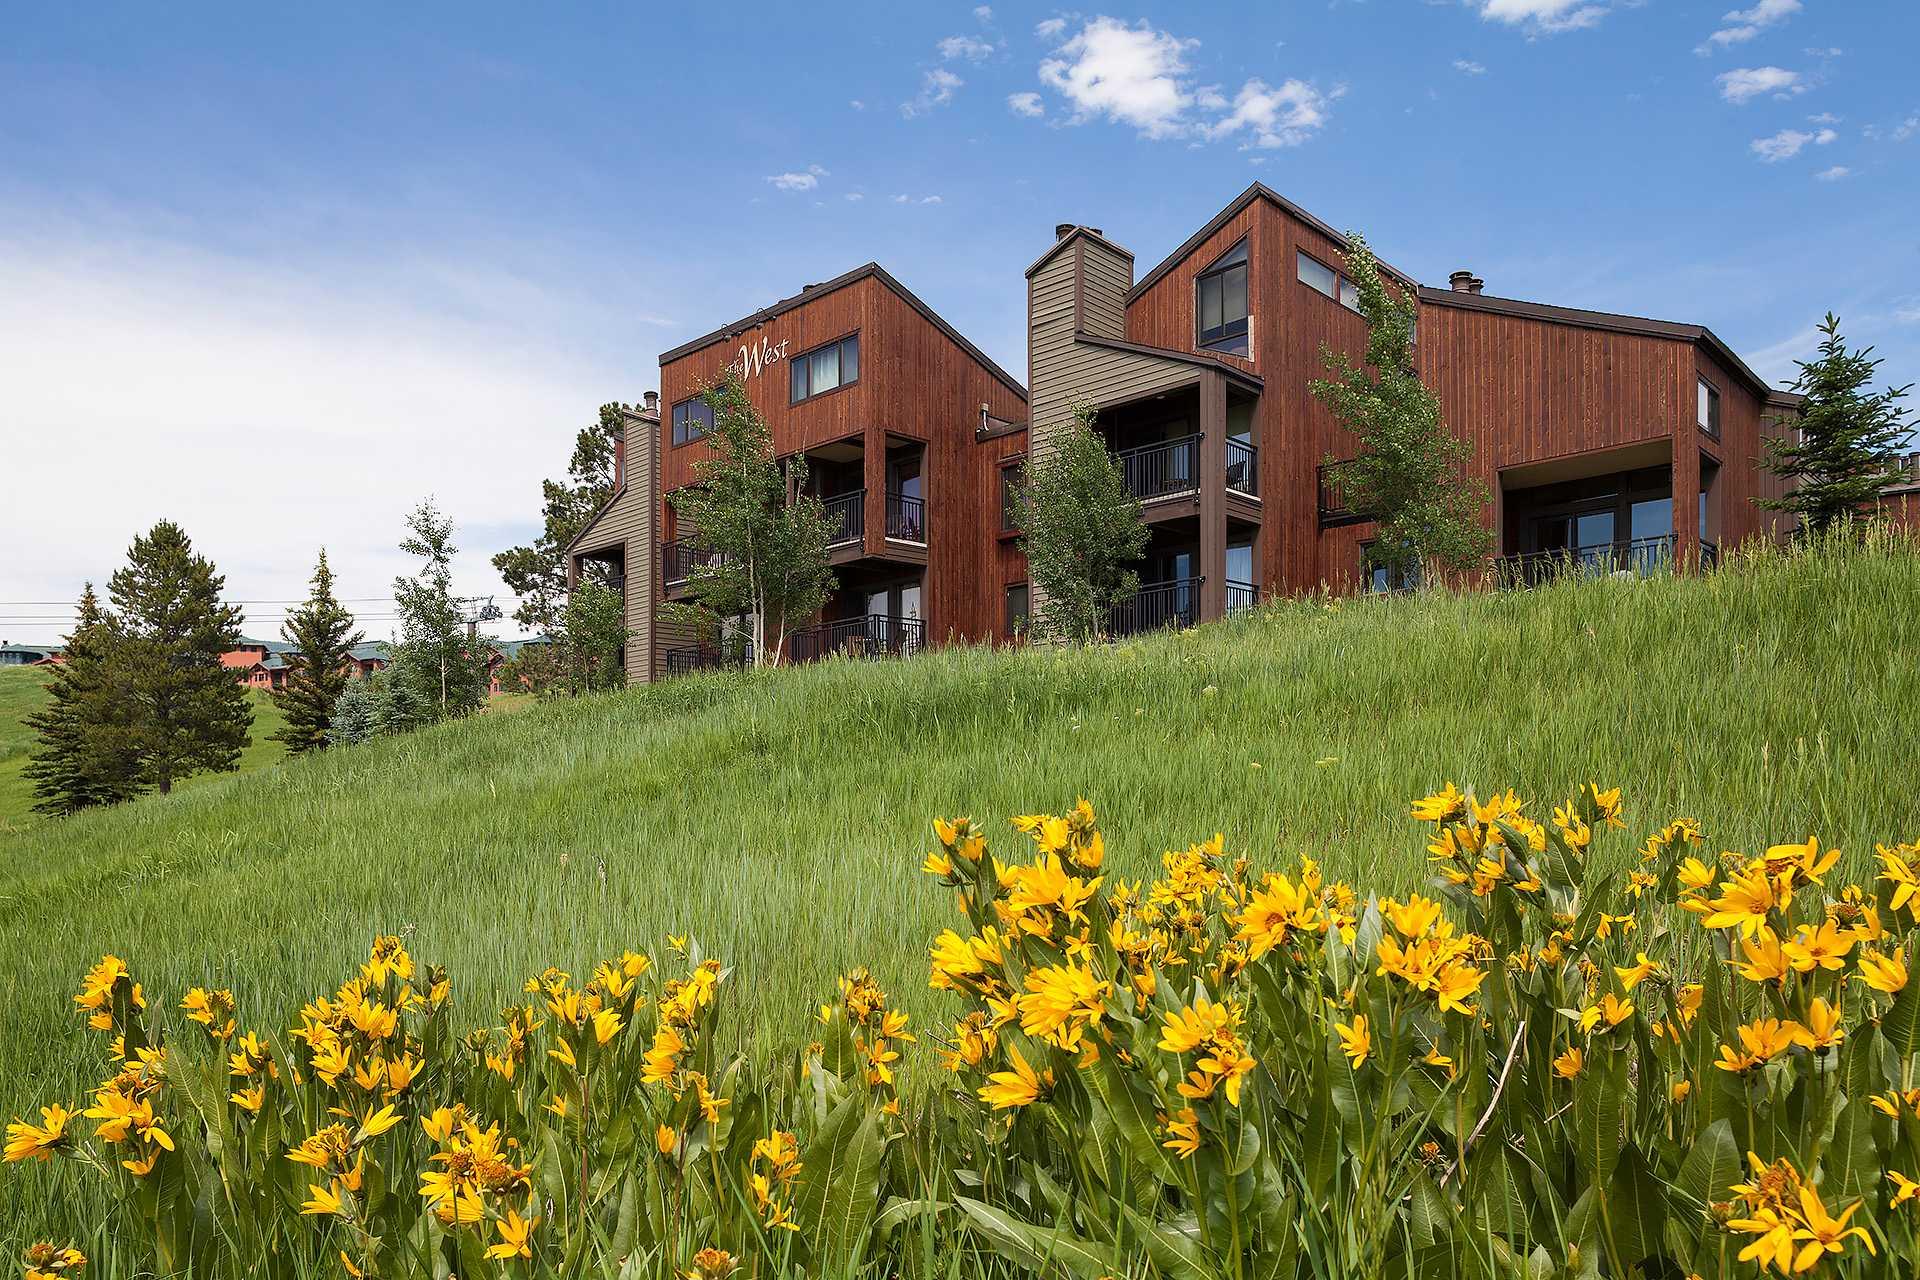 W3226: The West Condominiums